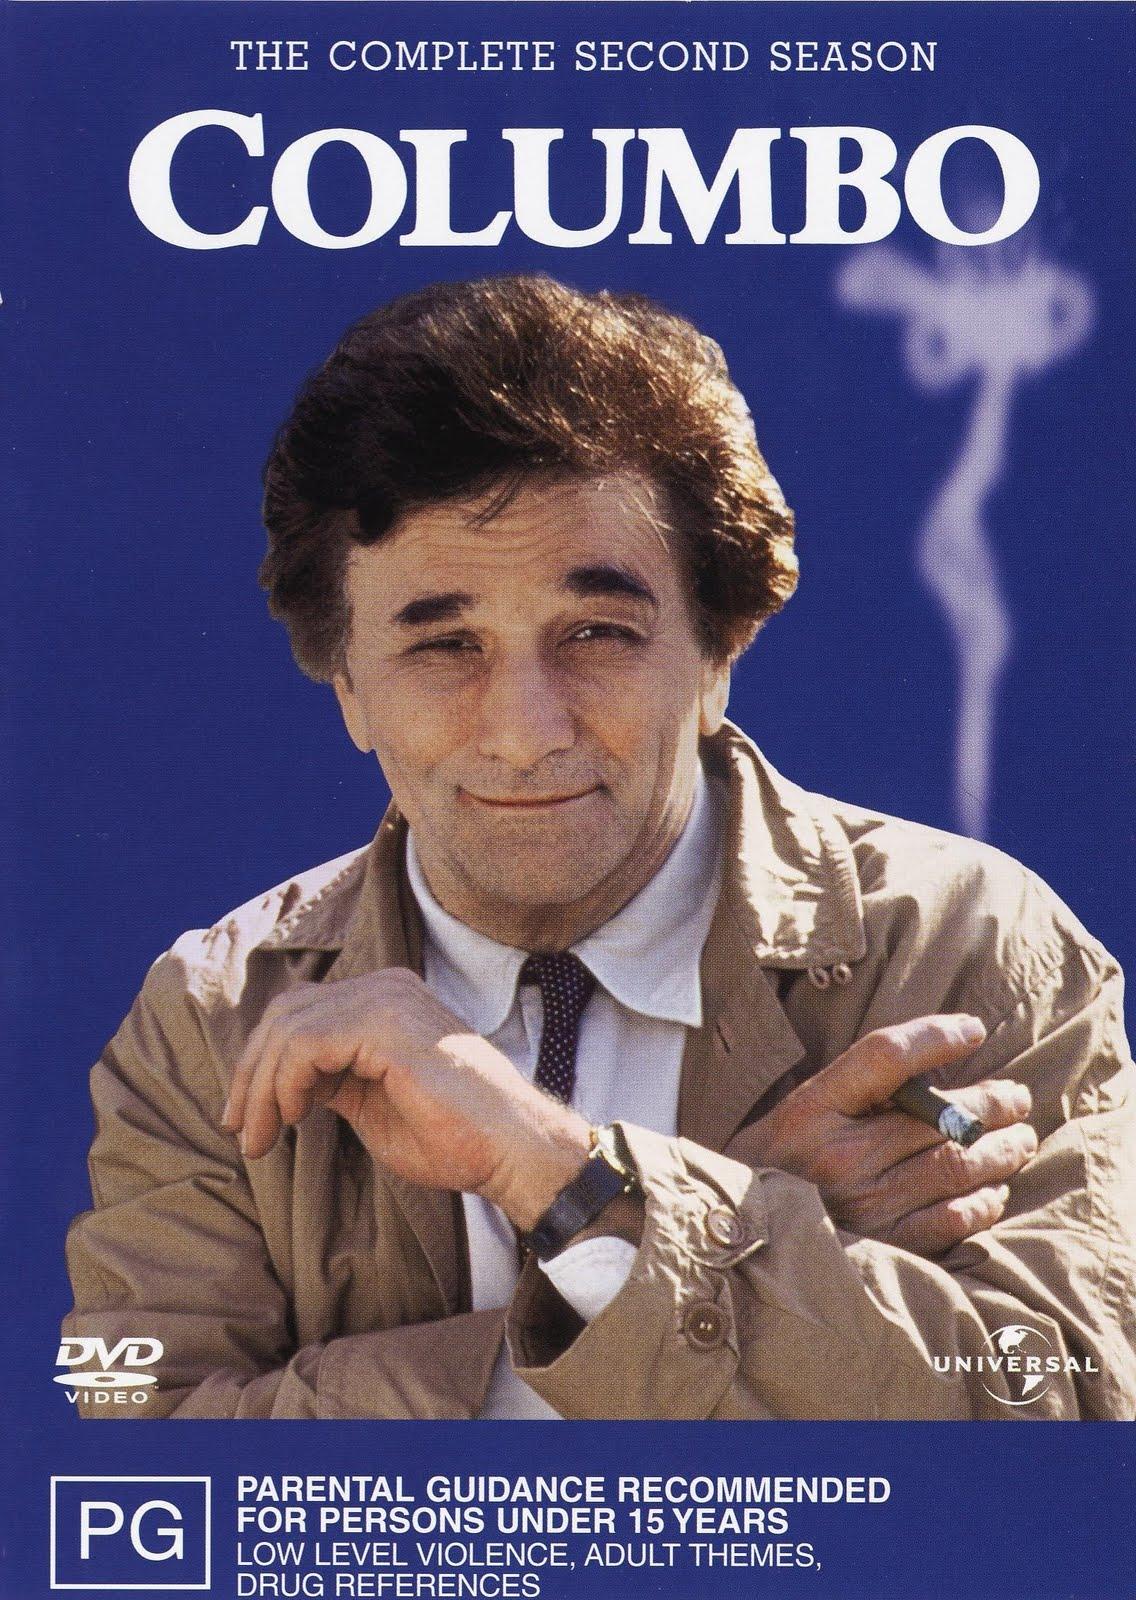 Columbo (1971 series)   Cinemorgue Wiki   FANDOM powered by Wikia